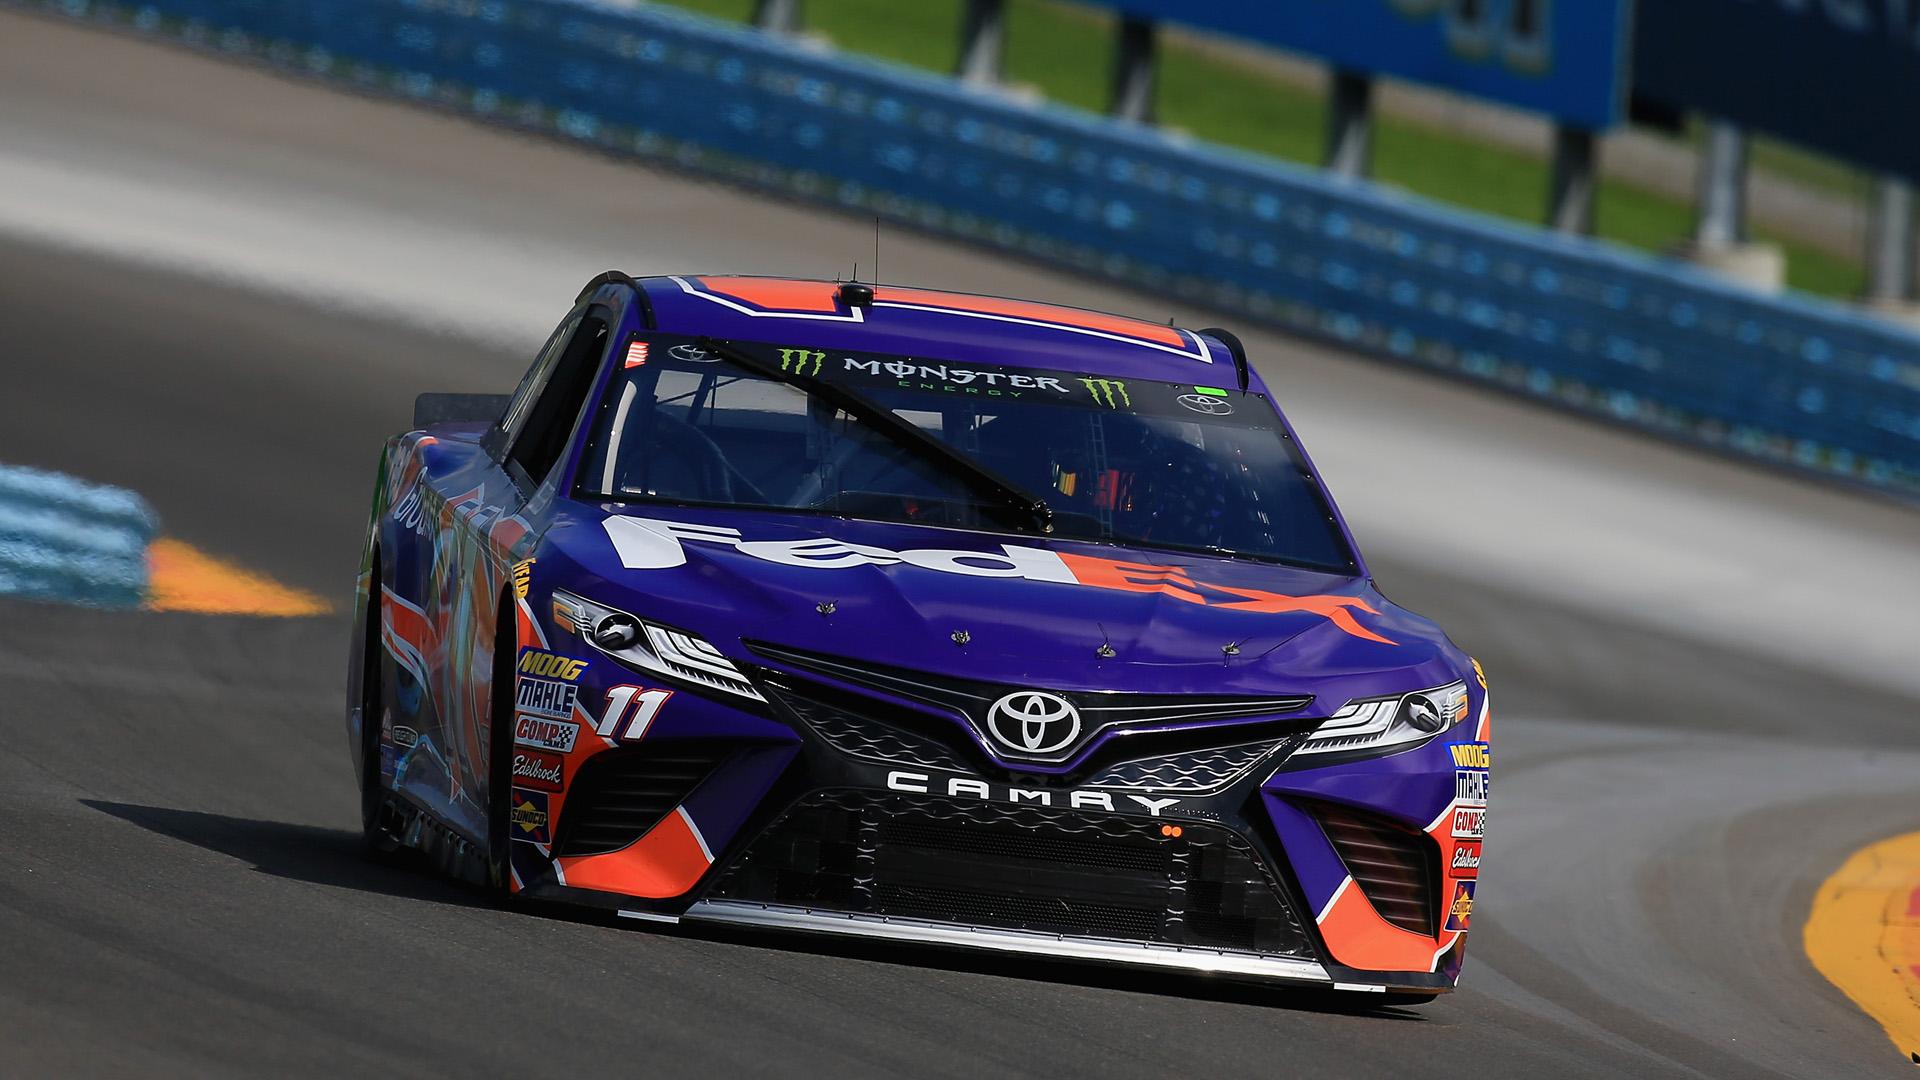 NASCAR at Texas: Denny Hamlin still expects mayhem in qualifying despite rule changes